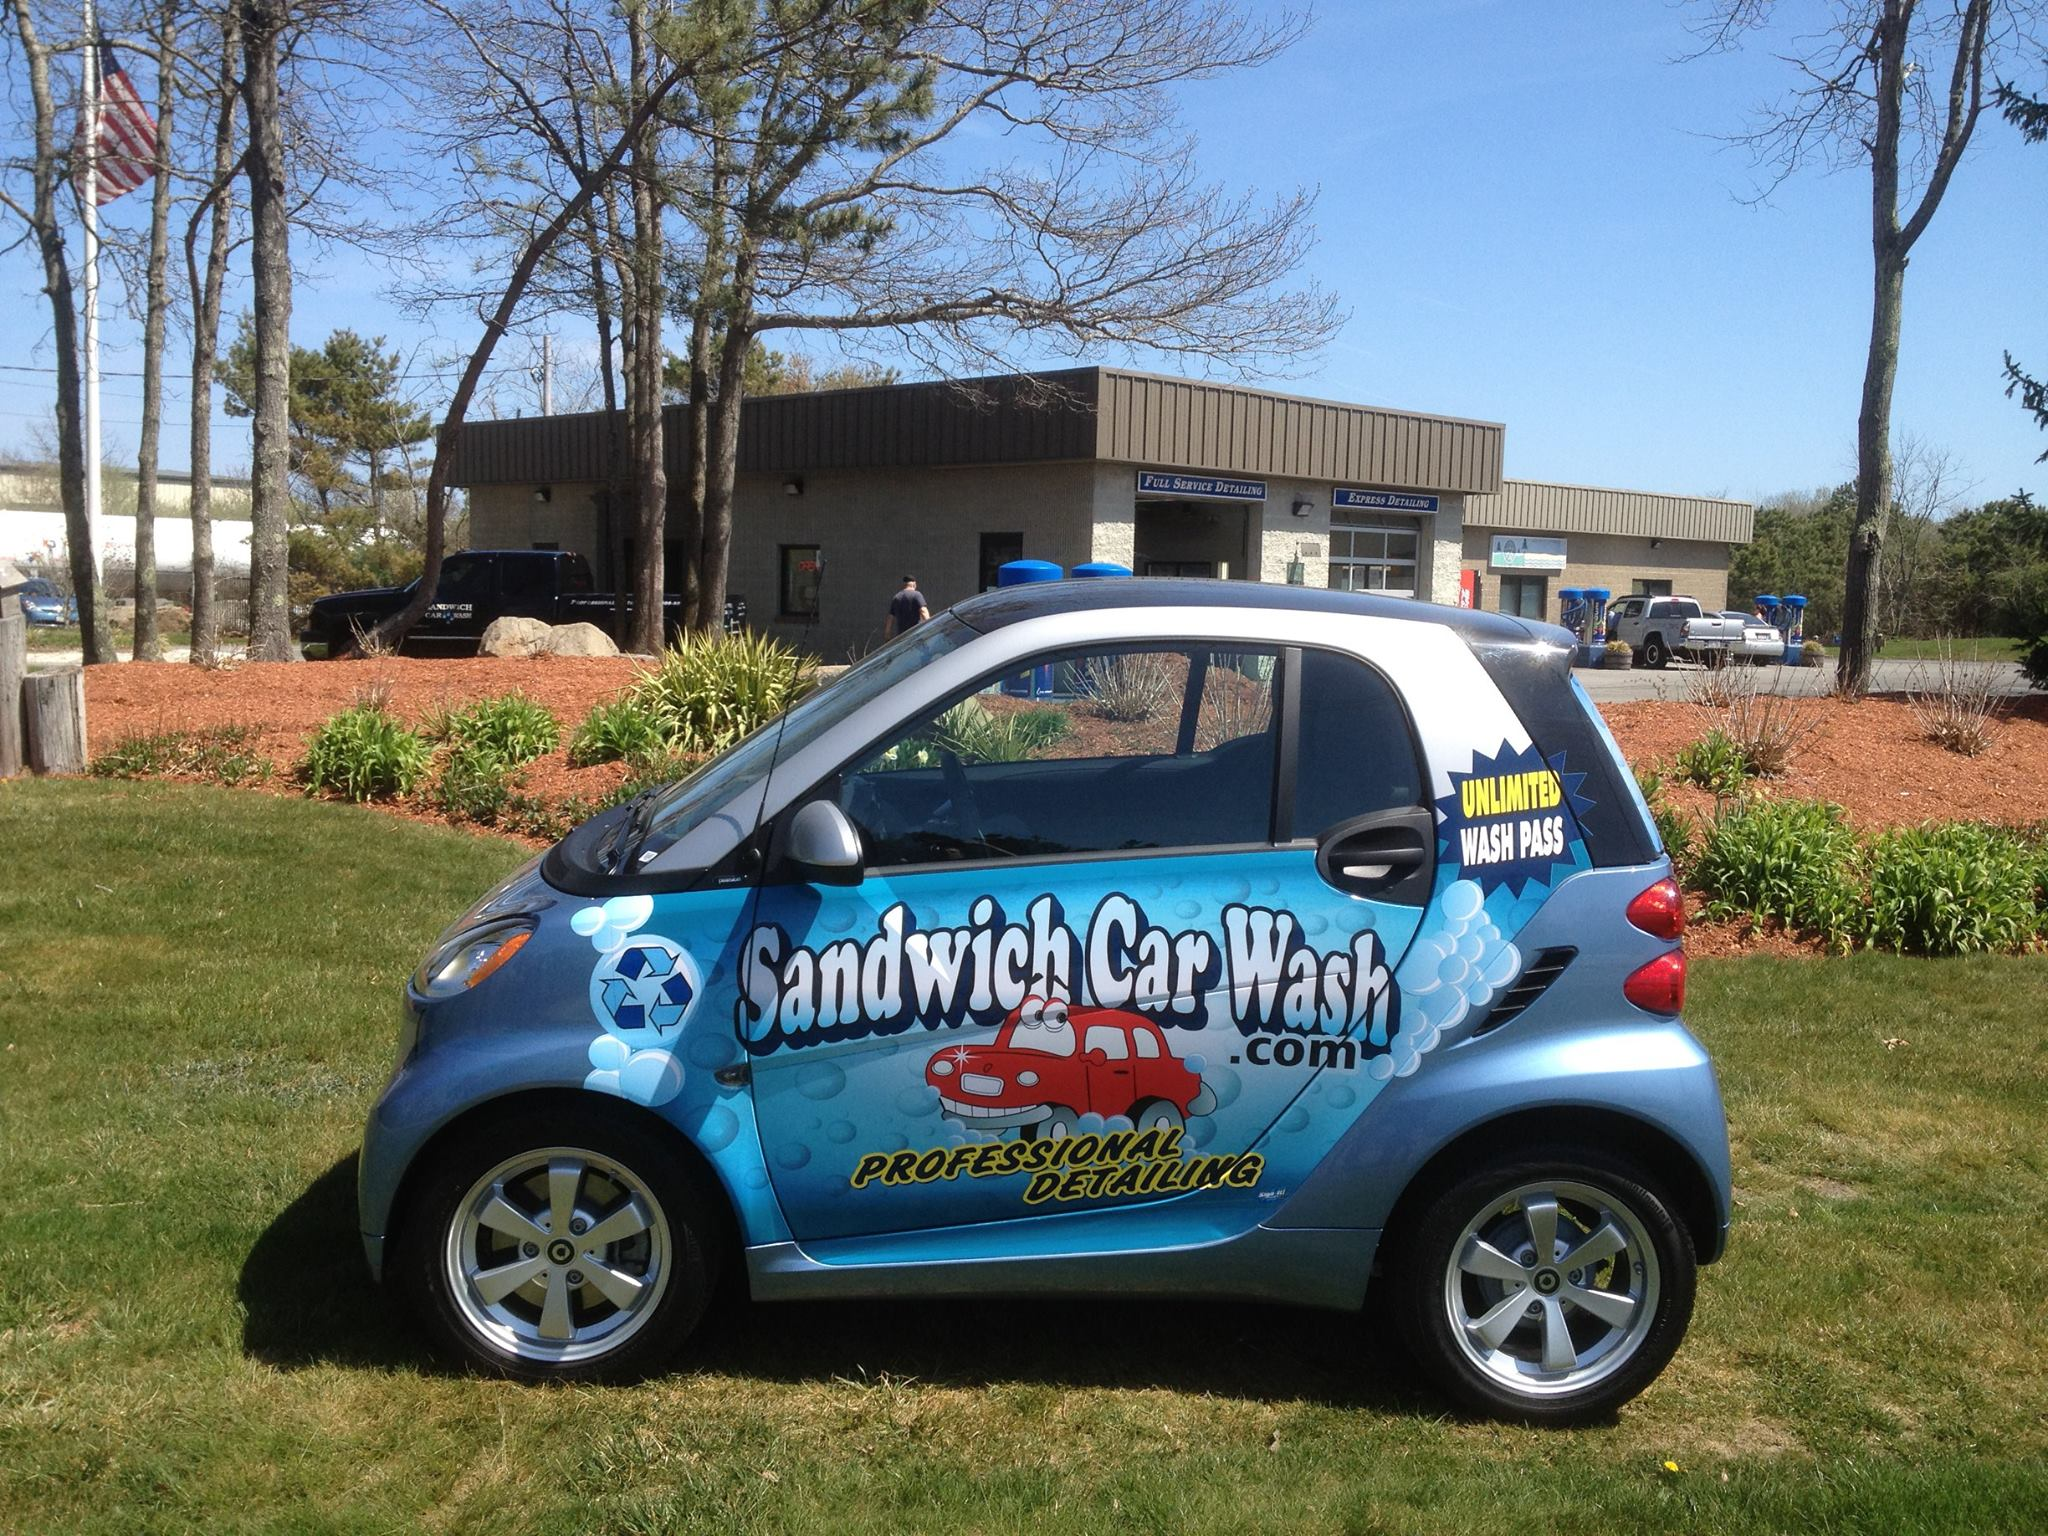 sandwich car wash